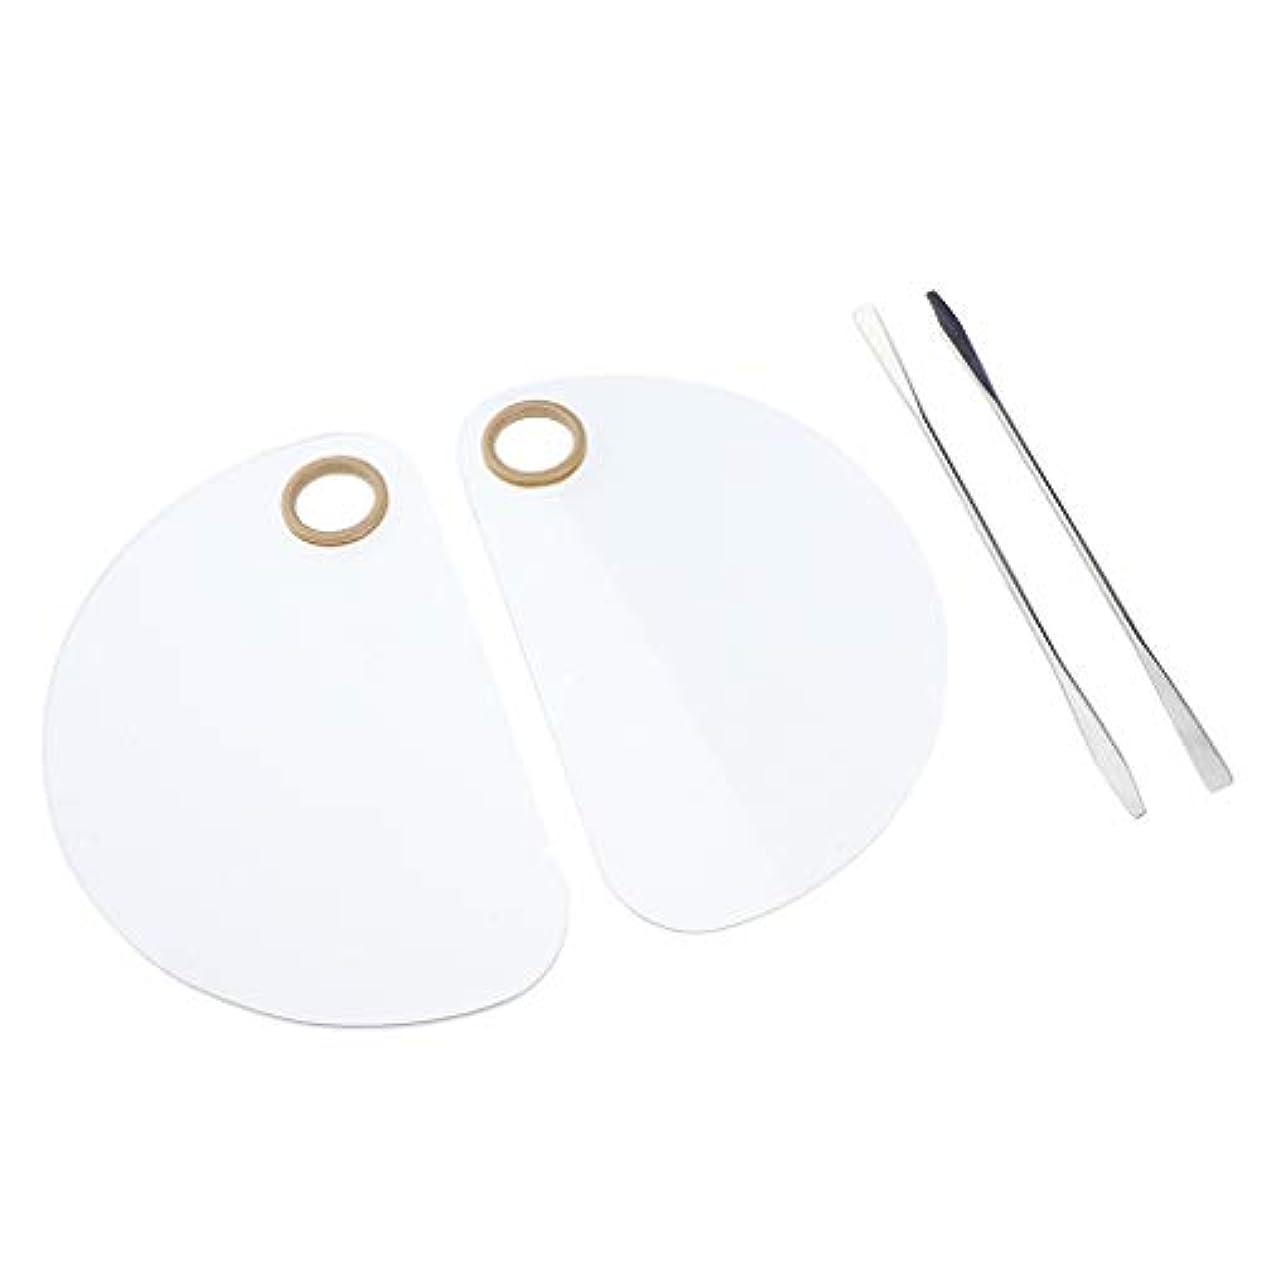 Perfeclan 2個入り ペイントパレット 透明パレット スパチュラ付き 全3選択 - 丸い